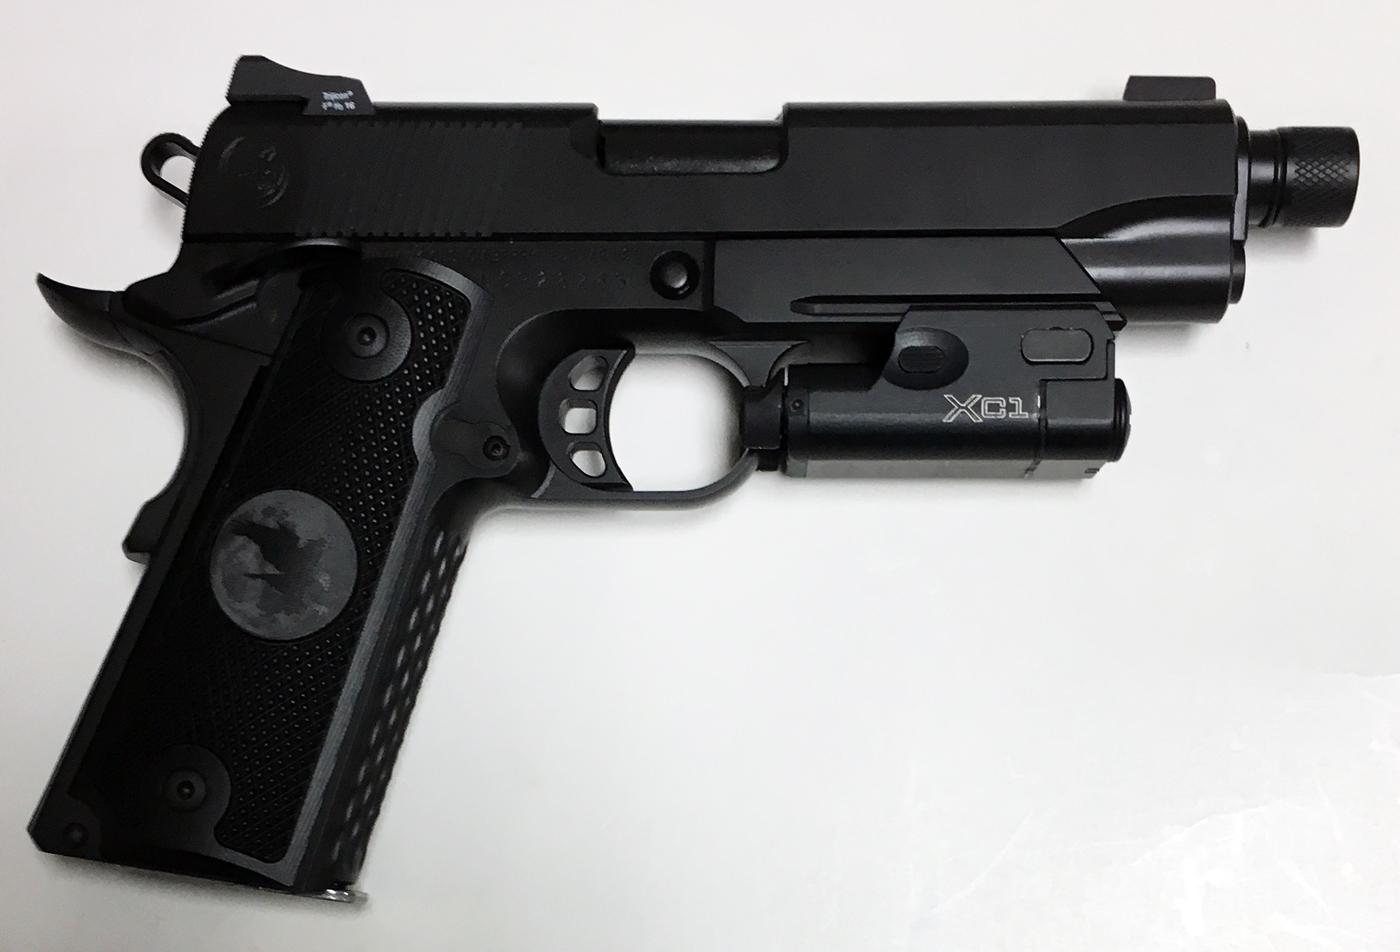 The Scopesmith The Gun Room—